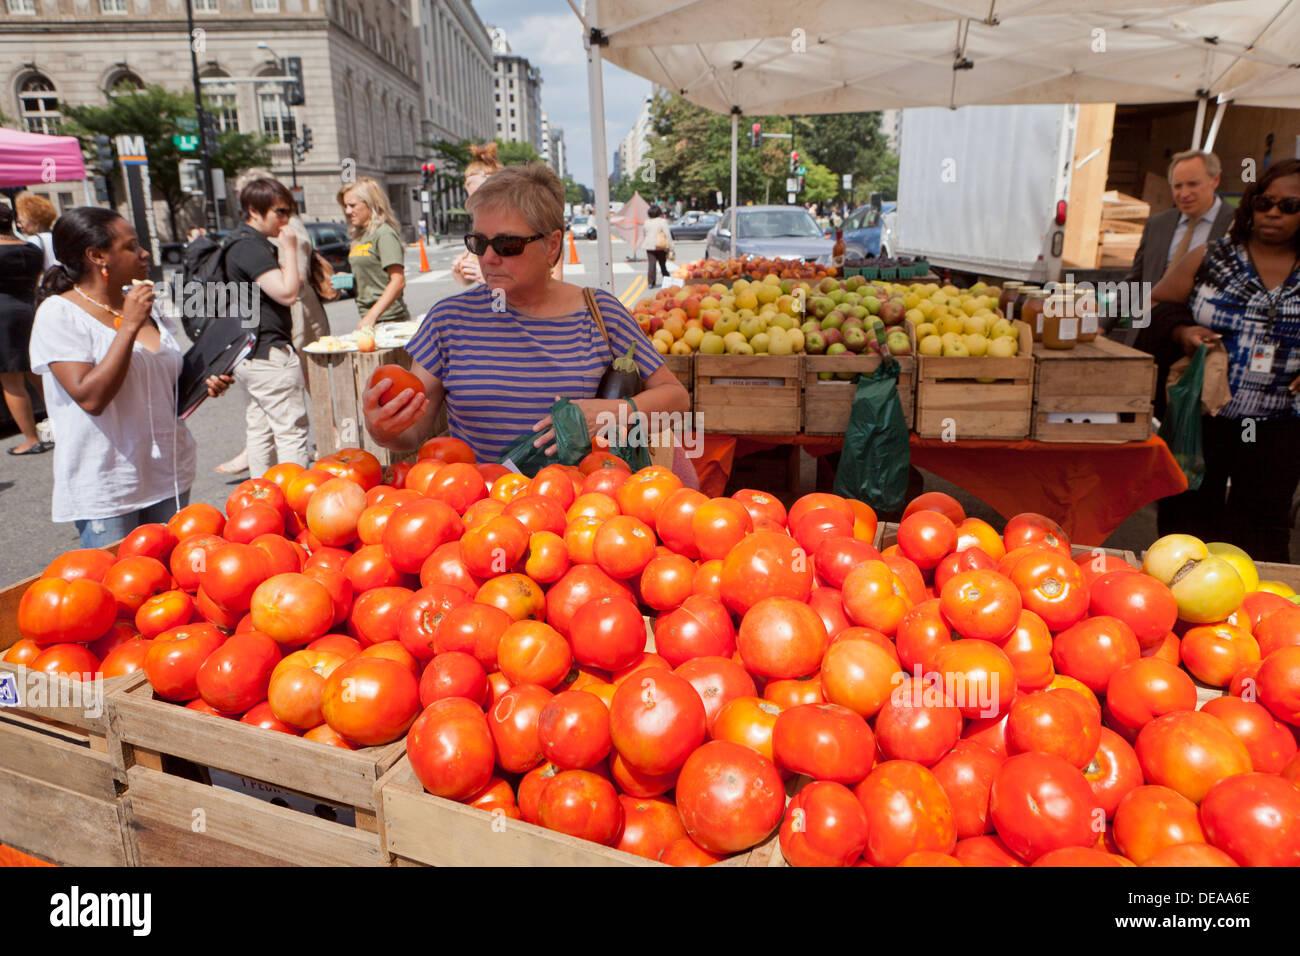 Woman buying fresh tomatoes at farmers market - Washington, DC USA Stock Photo